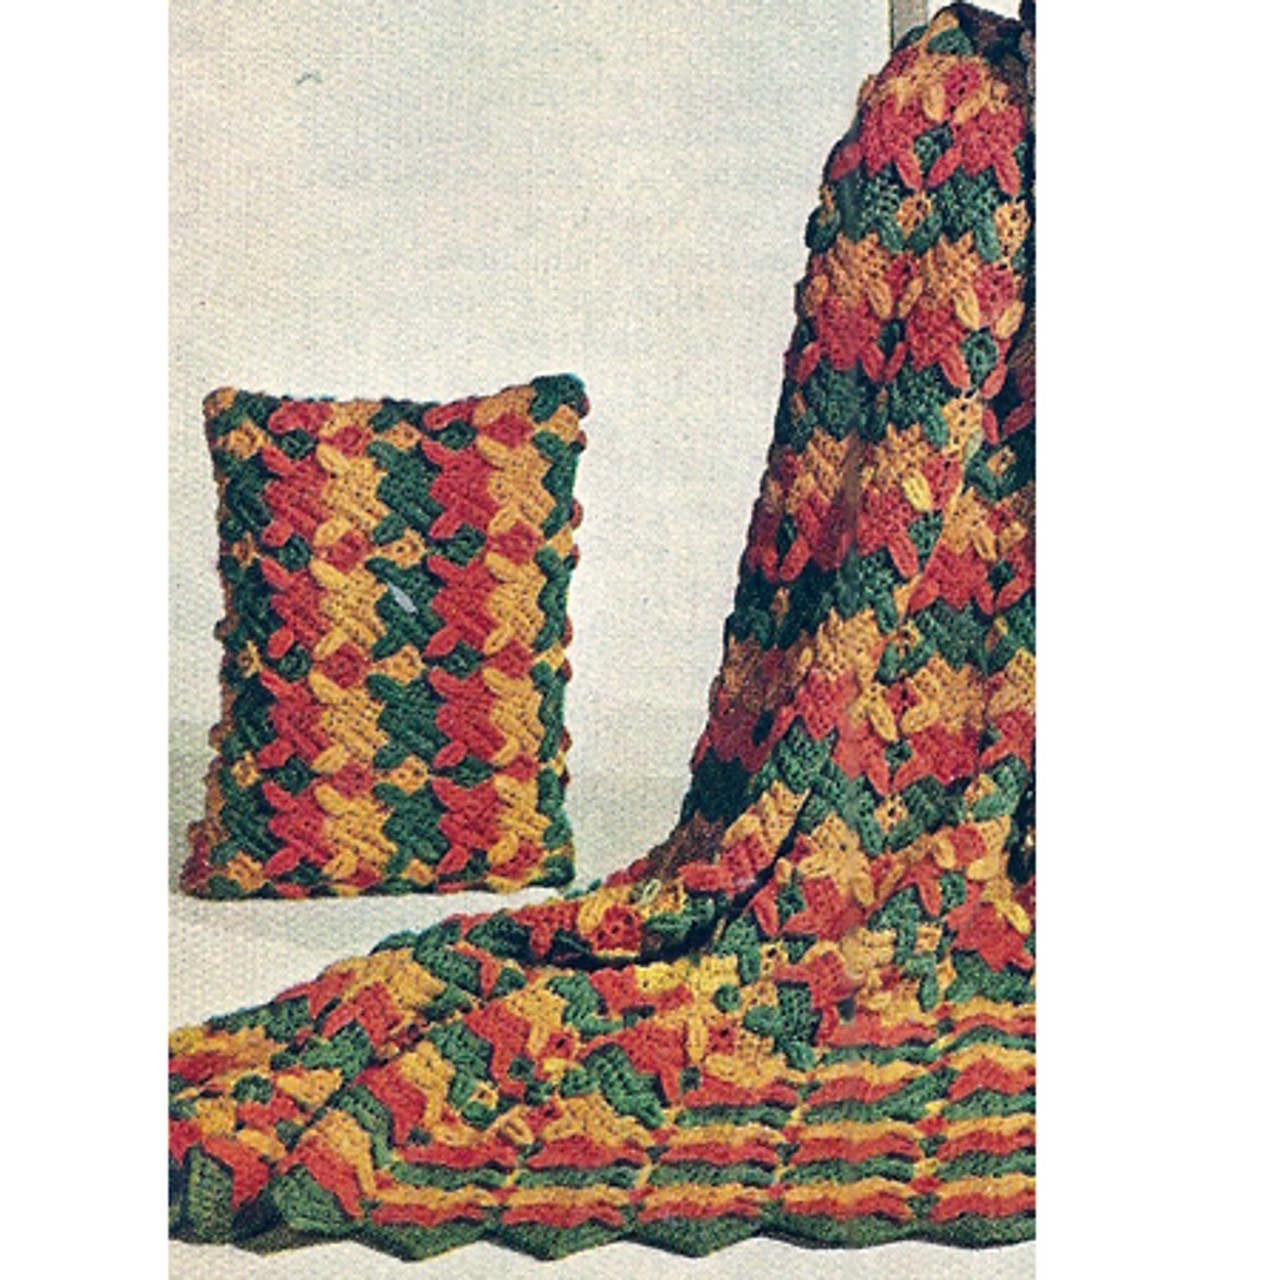 Vintage Ripple Crochet Pattern with Overleaf